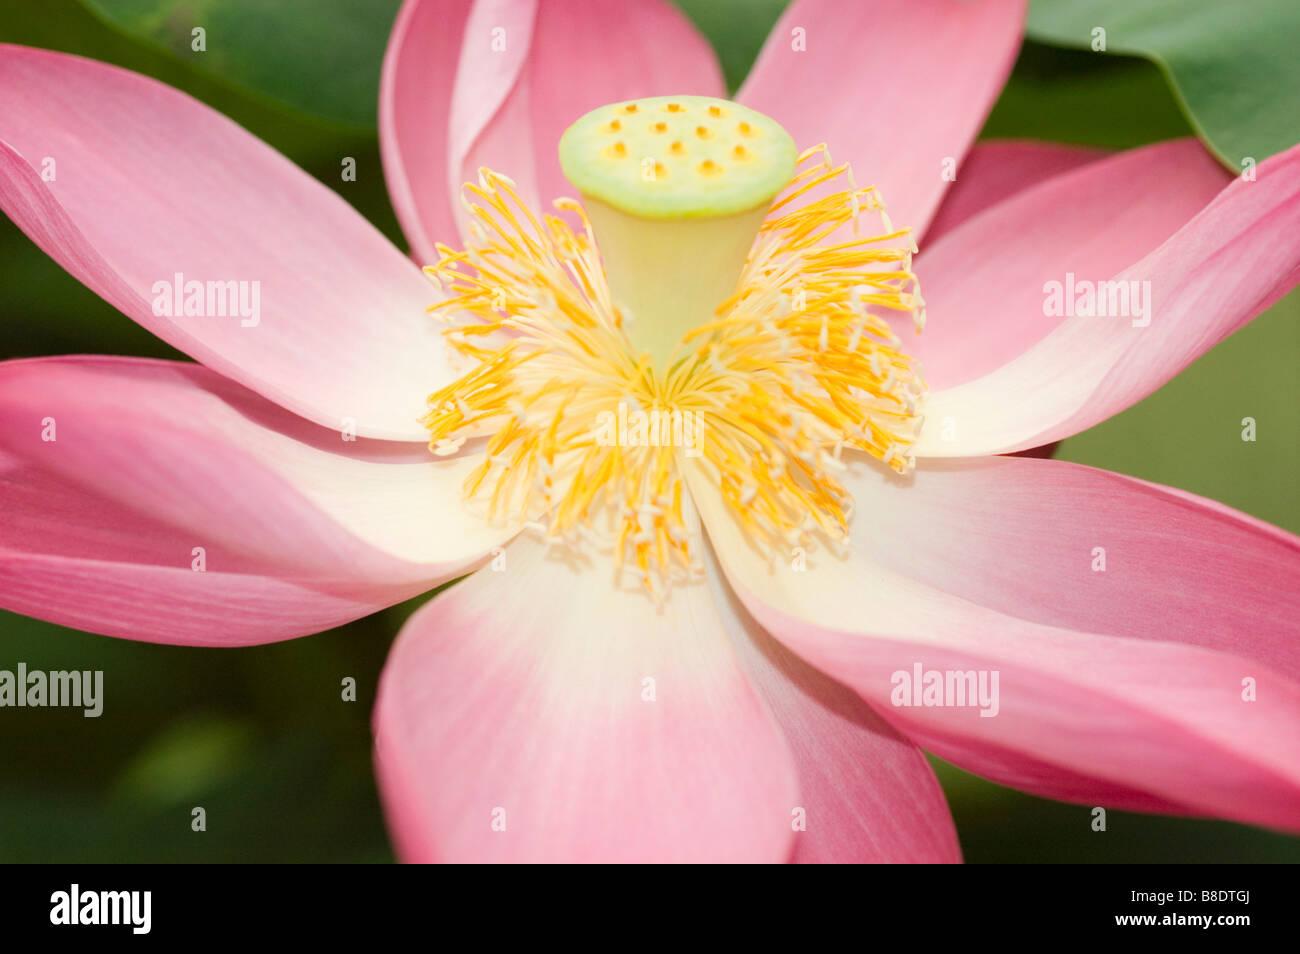 Nelumbo nucifera stock photos nelumbo nucifera stock images alamy pink yellow flower of nelumbo nucifera indian lotus sacred lotus bean of india izmirmasajfo Choice Image